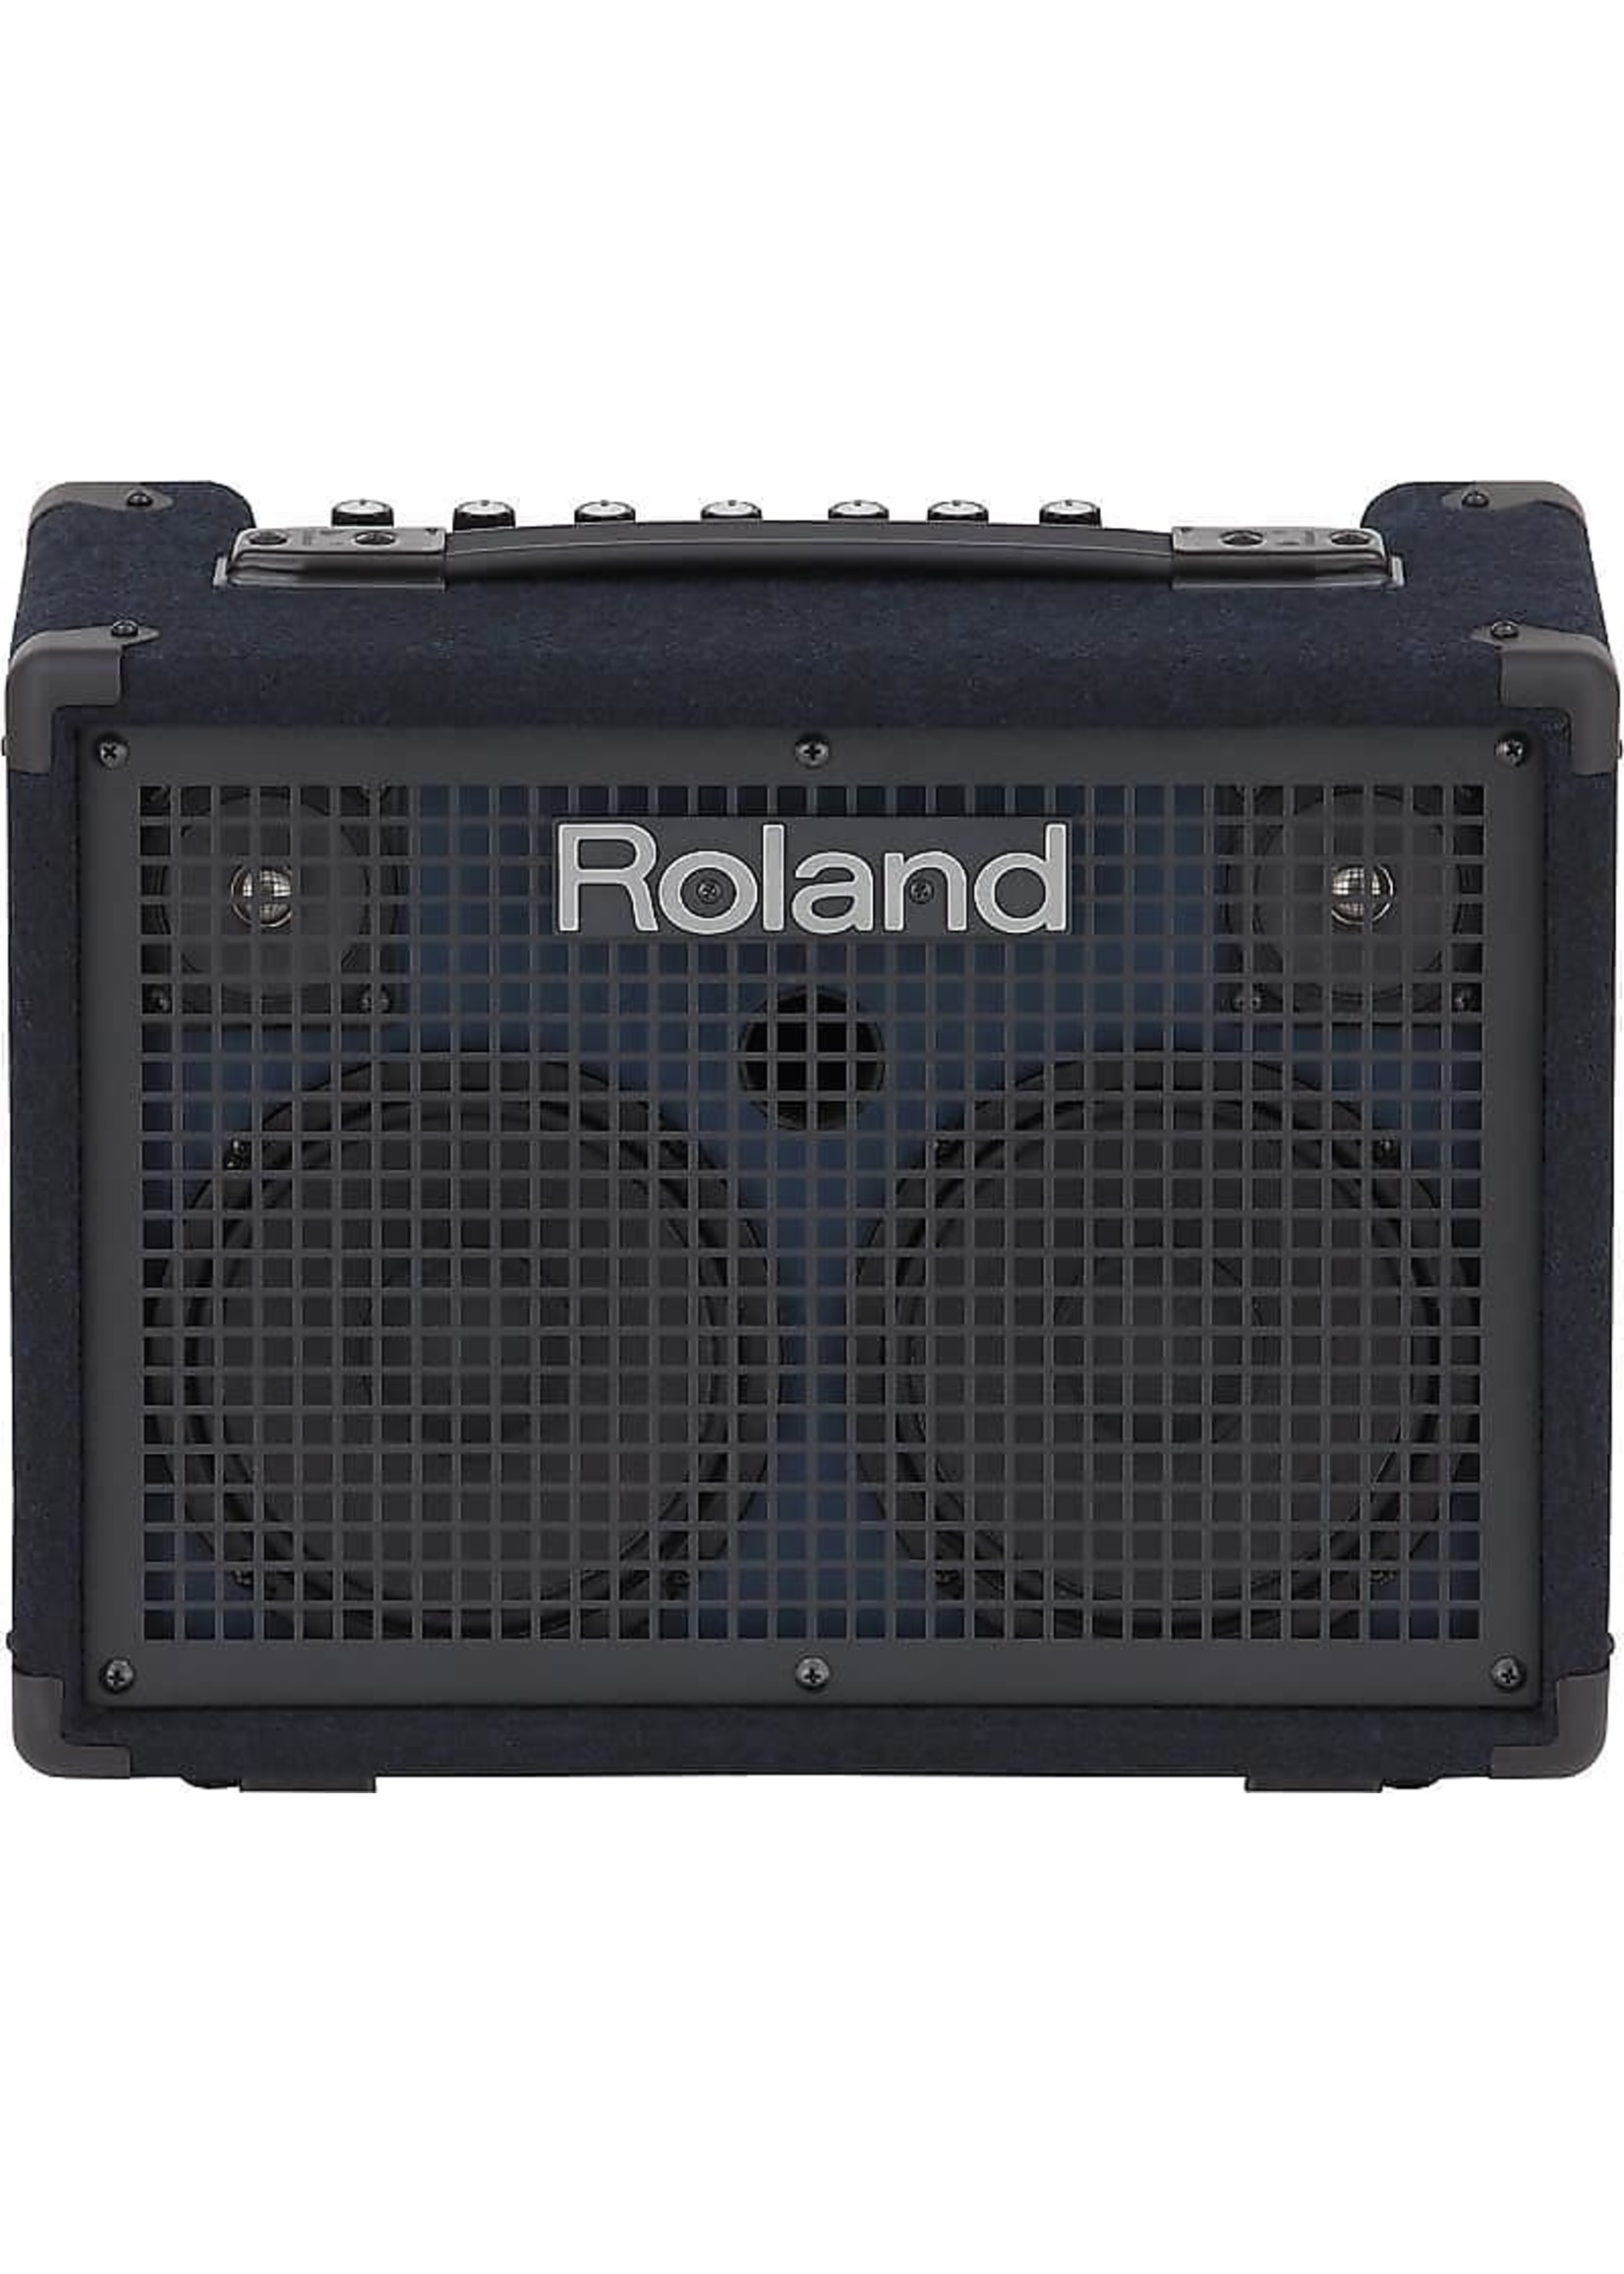 "Roland Roland KC-220 3-Channel 30-Watt 2x6.5"" Keyboard Combo"